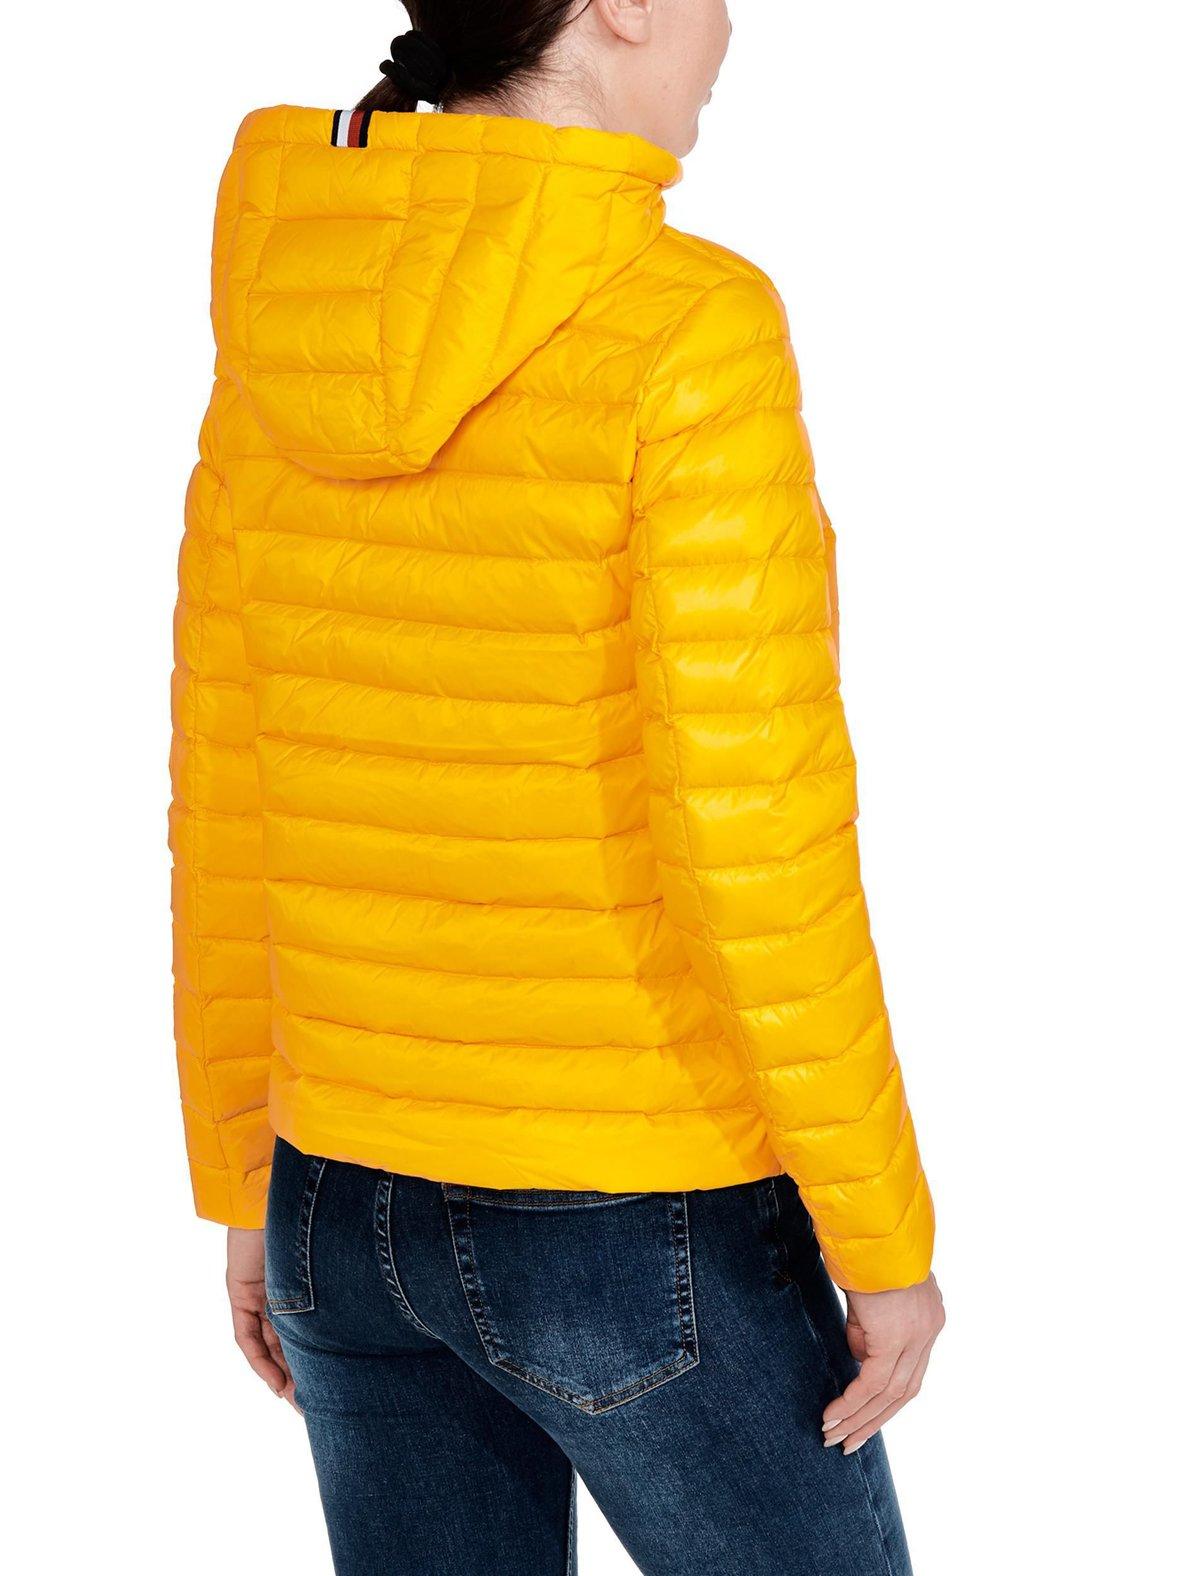 Spectra Yellow Tommy Hilfiger Essential-kevytuntuvatakki WW0WW25279 ... 6d0e4b4344